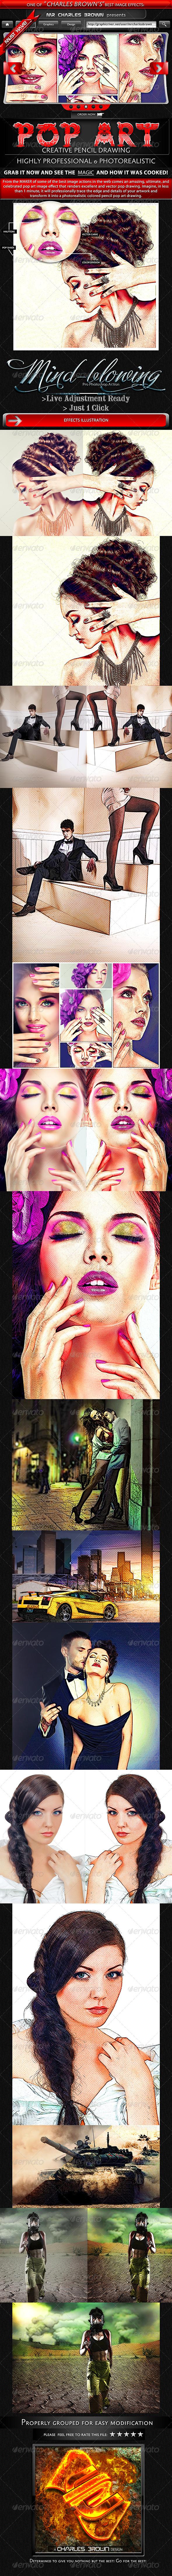 GraphicRiver Creative Pop Art Pencil Drawing 5148941